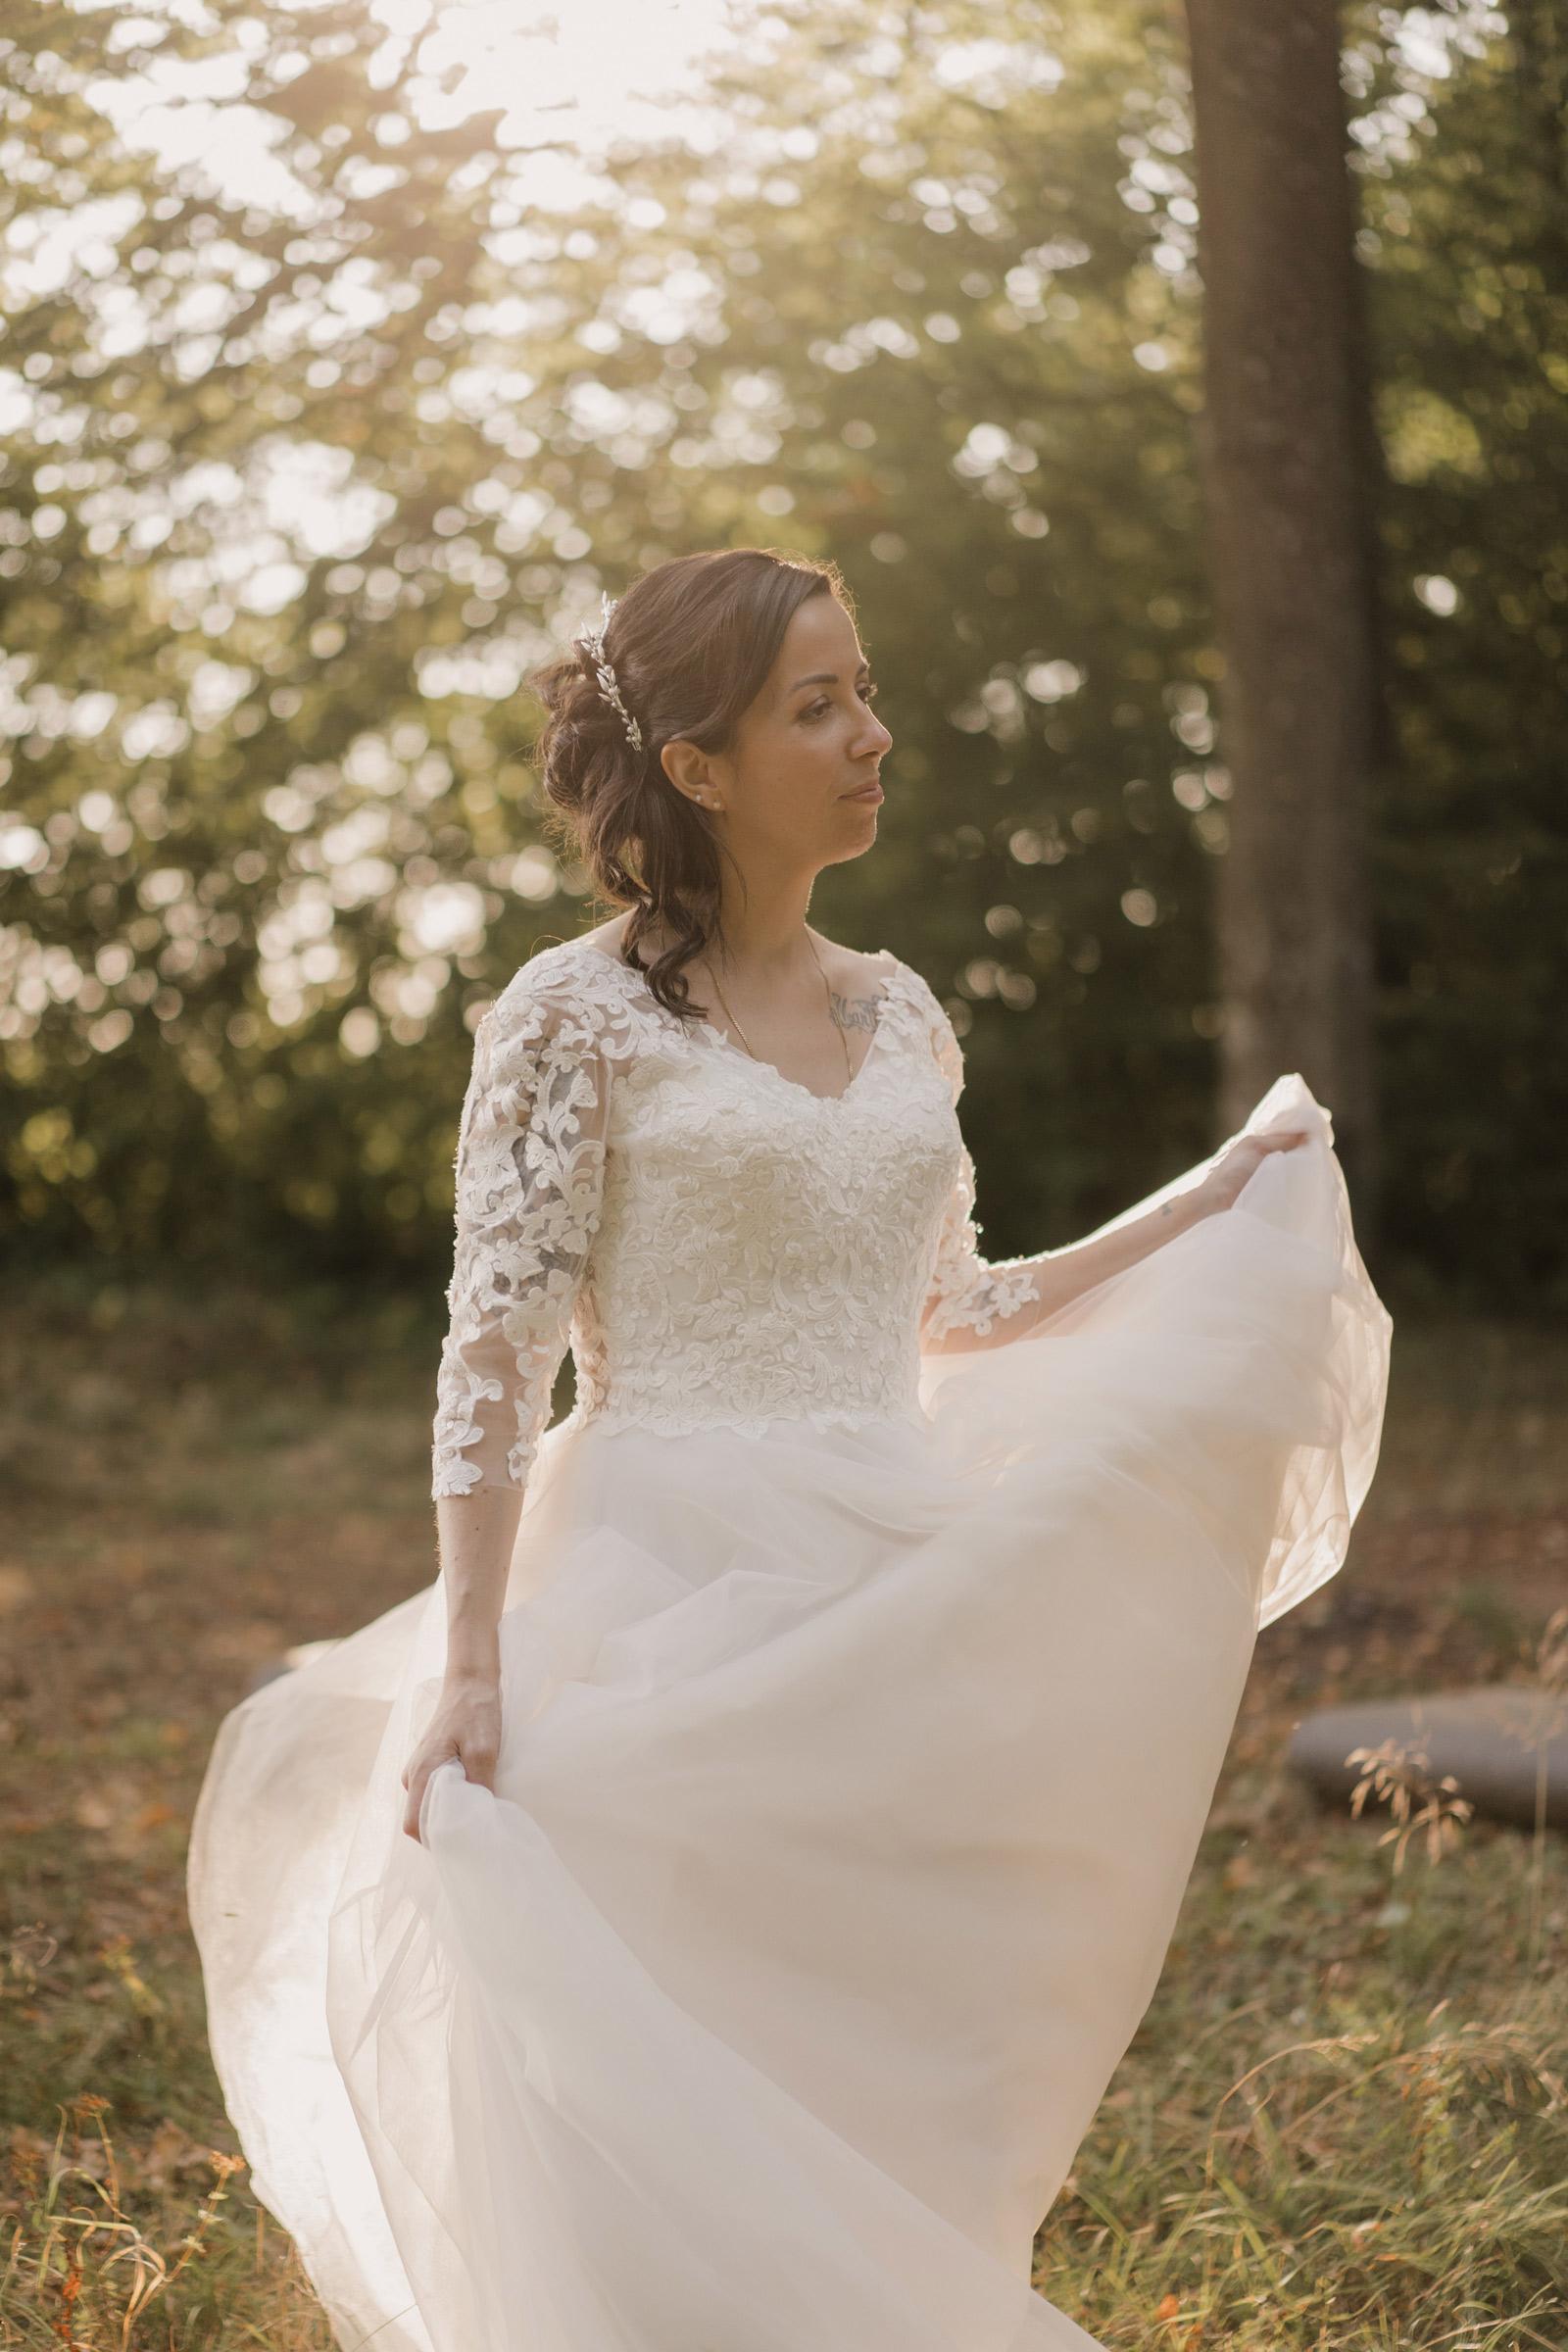 photographe_mariage_luxembourg_longwy_arlon_c2